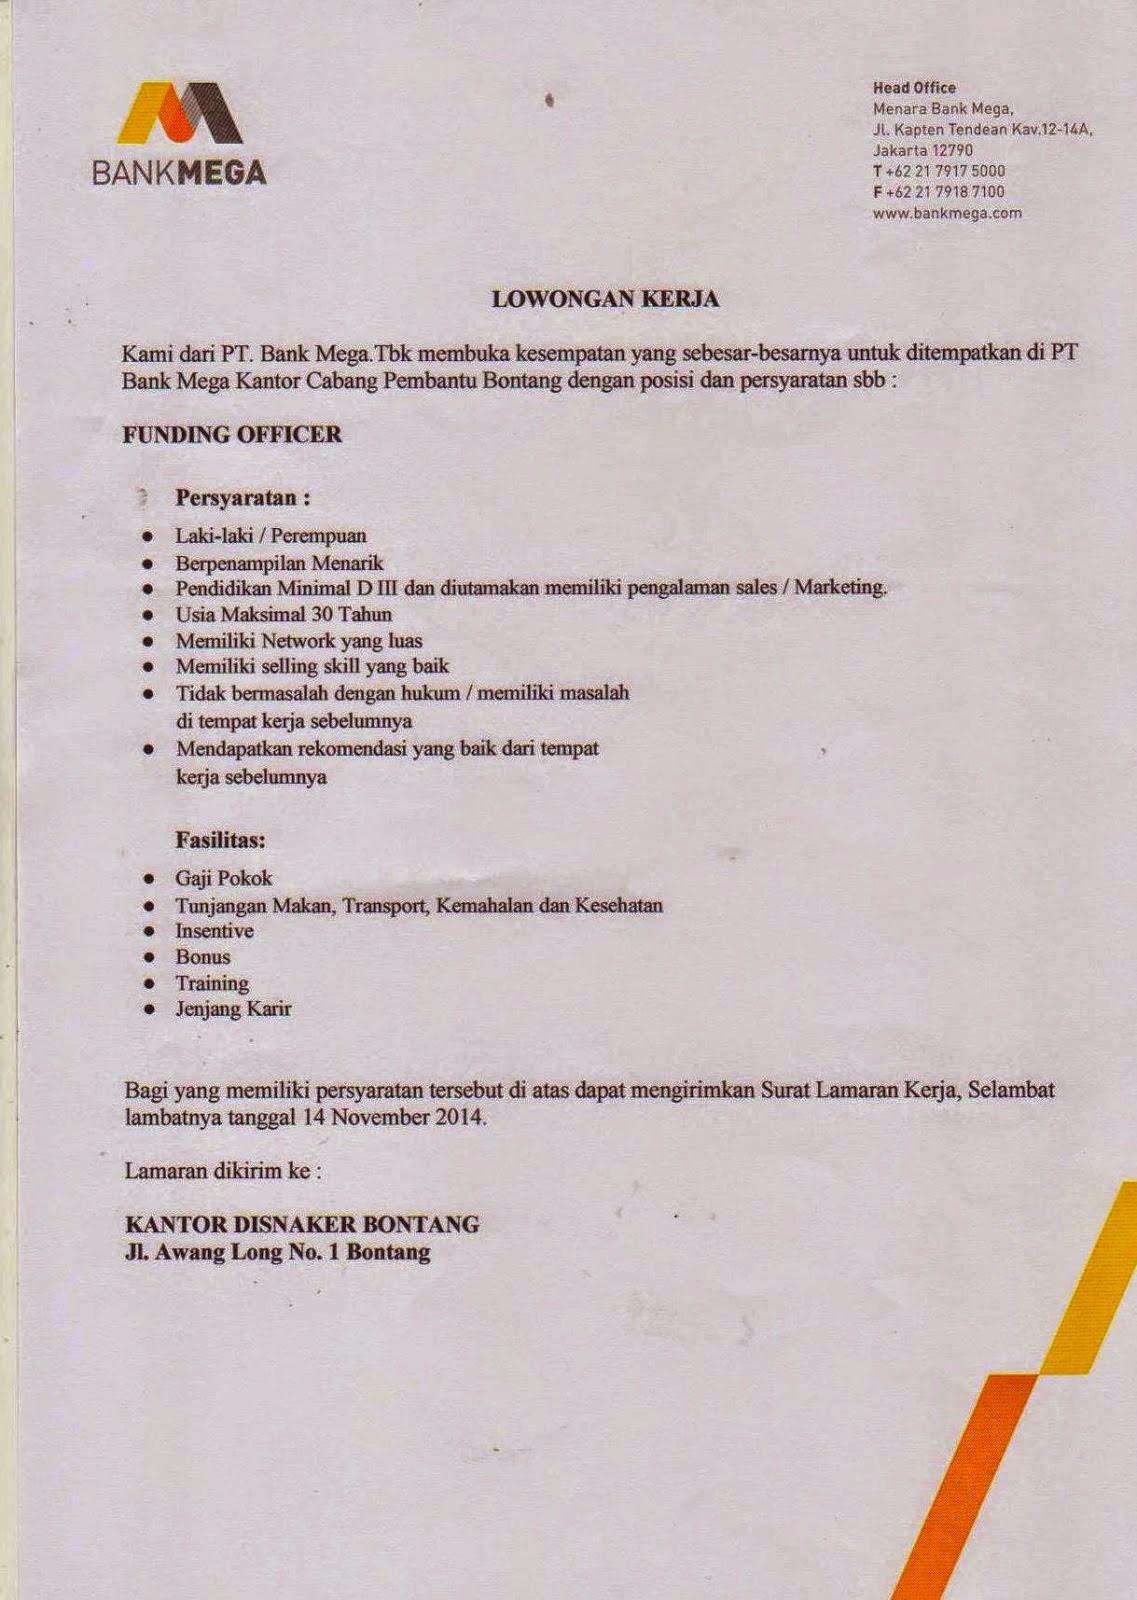 Lowongan  Kerja Funding Officer D3 Bank Mega Bontang